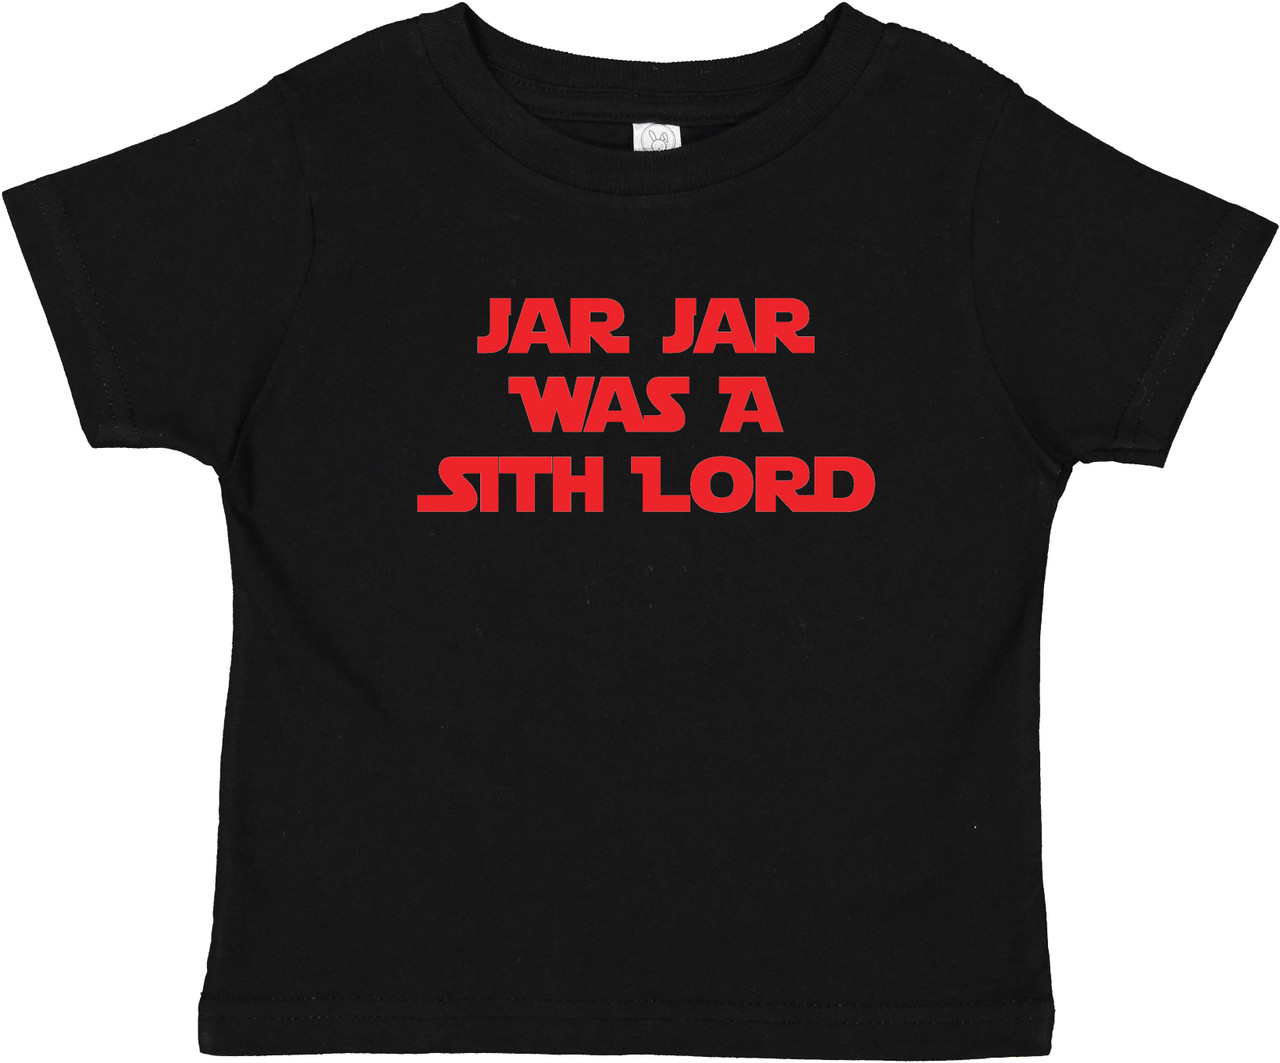 Jar Jar Was a Sith Star Force Baby Toddler Cotton T-Shirt Black